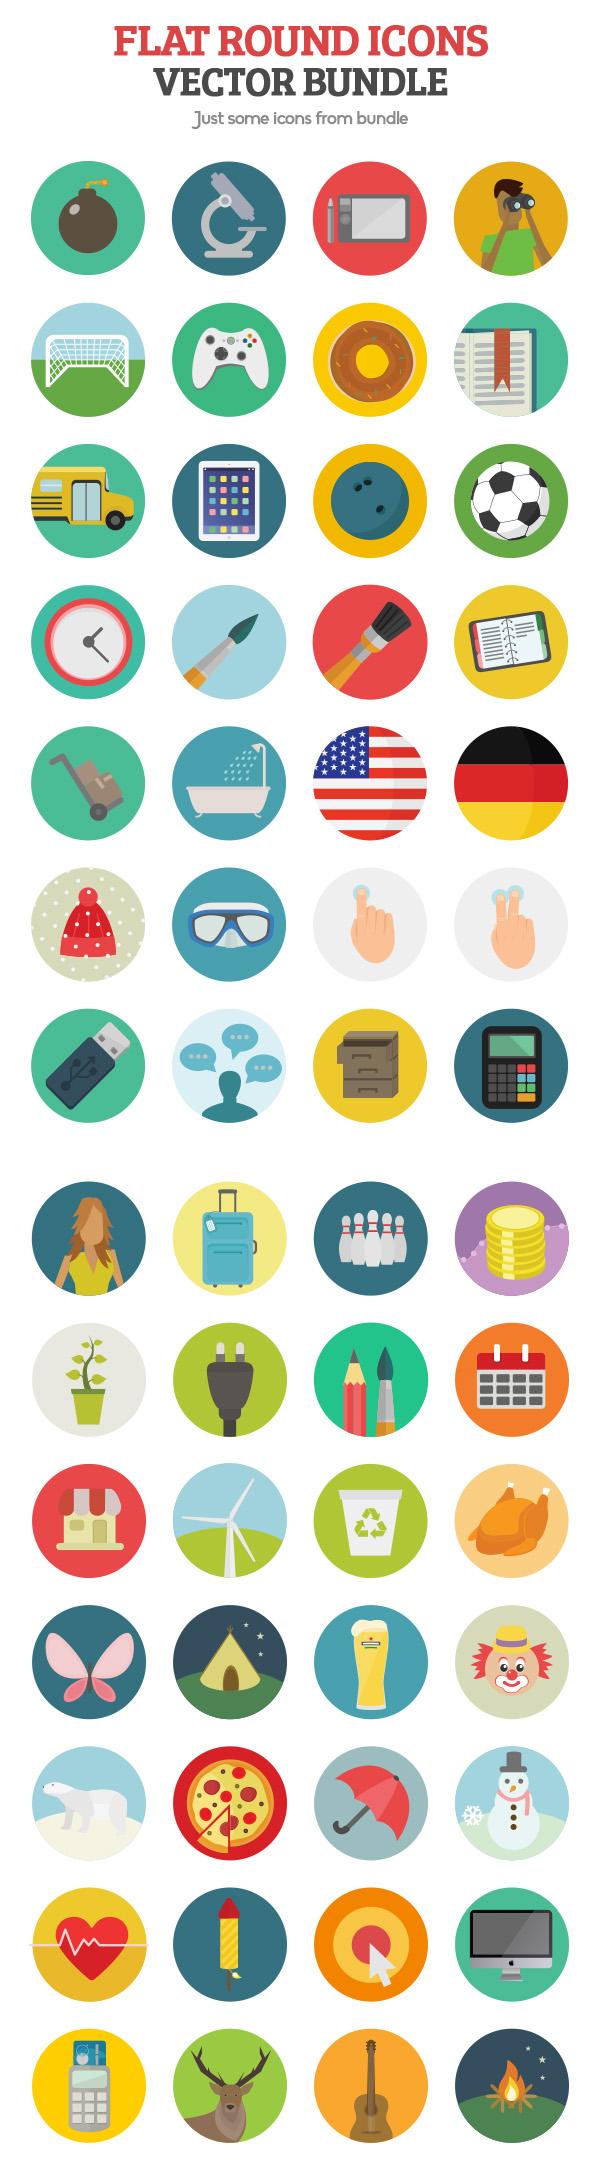 flat icons vector bundle